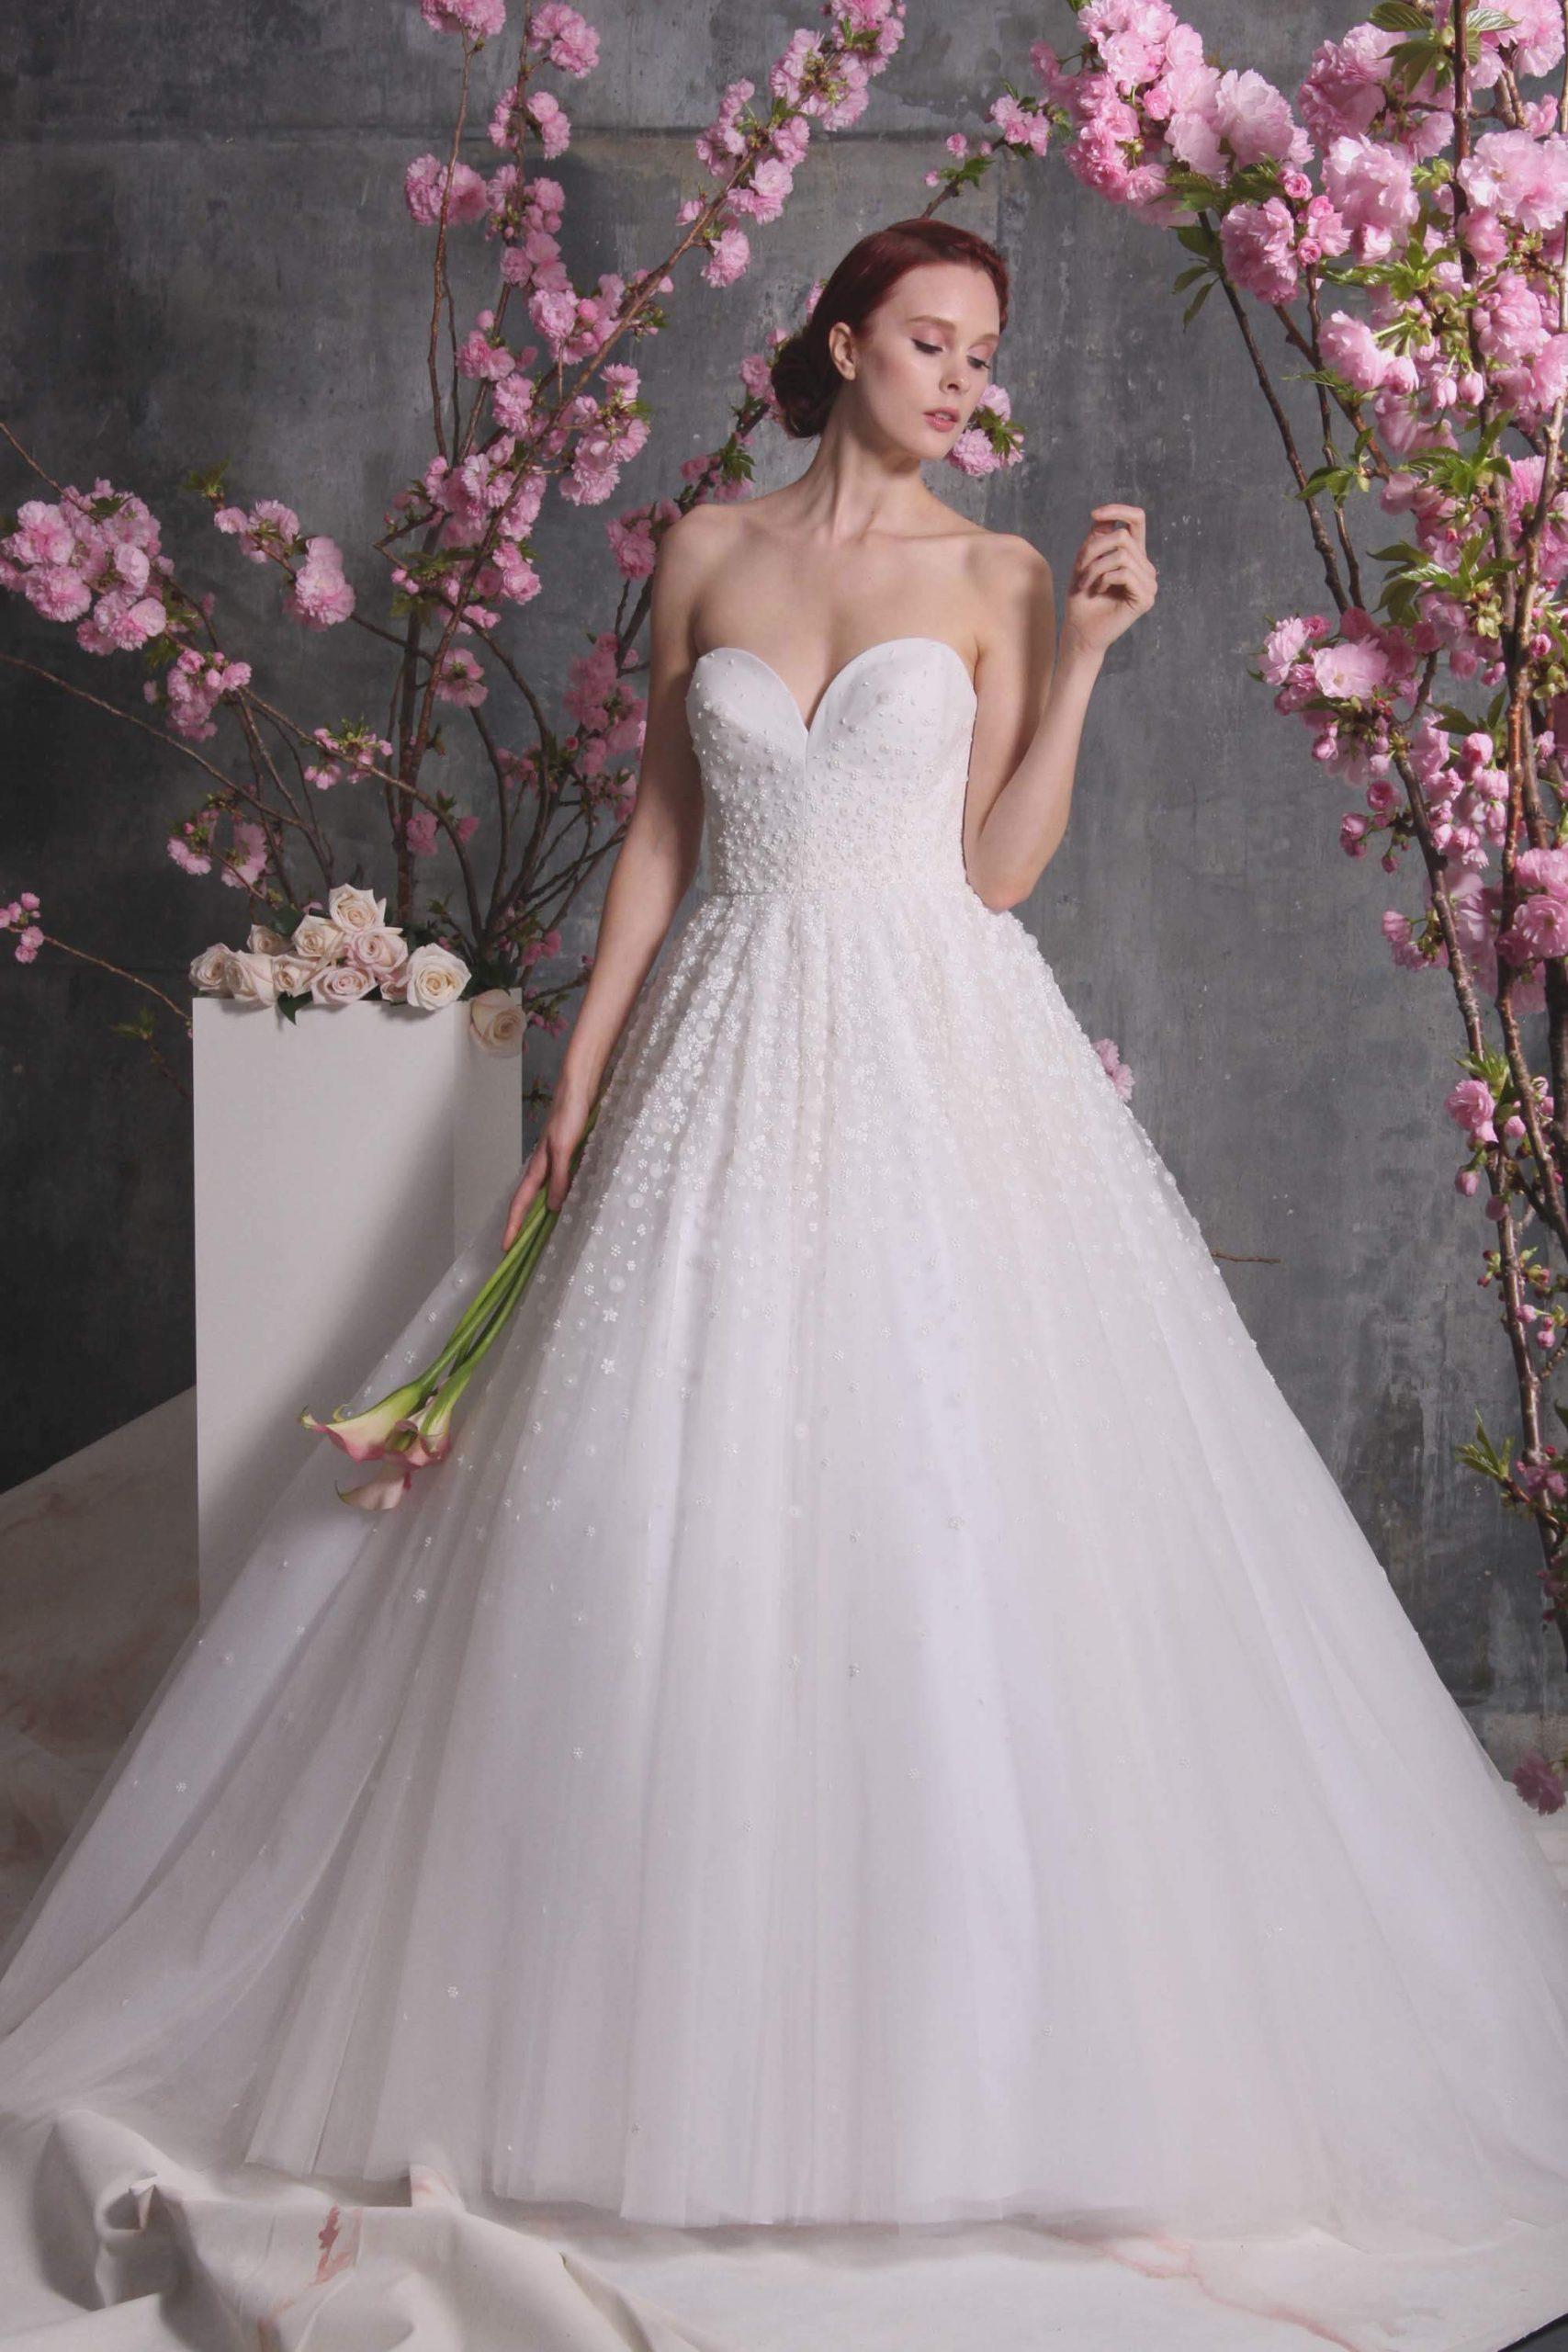 Christian Siriano Spring 2018 Bridal, Plus size bridal, plus size designer